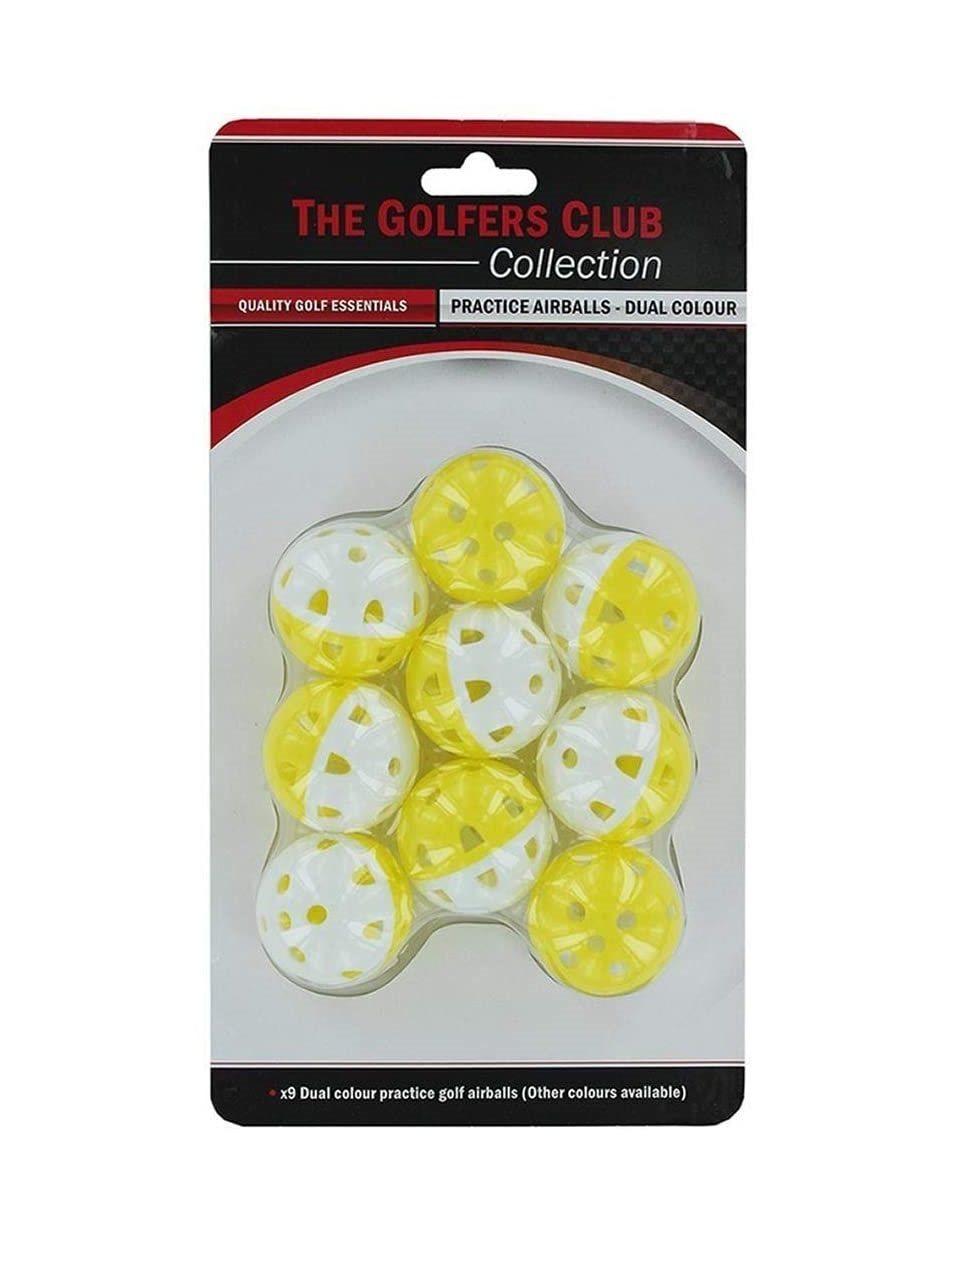 Golfers Club oefenballen Practice Airball 9 stuks